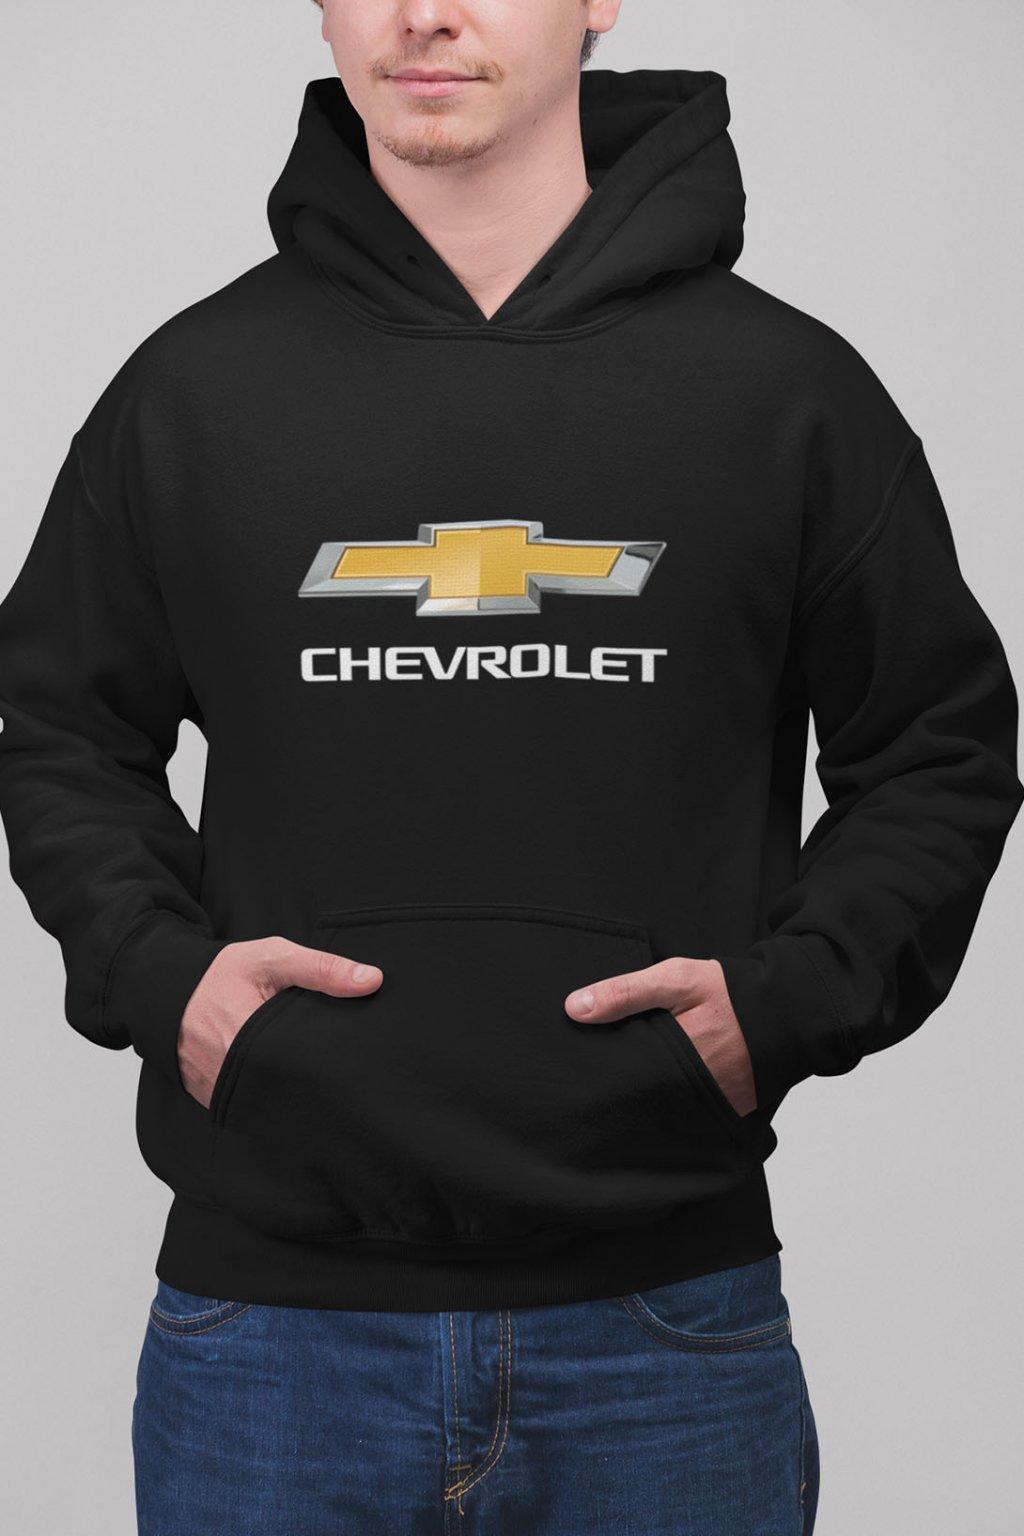 Pánska mikina s logom auta Chevrolet